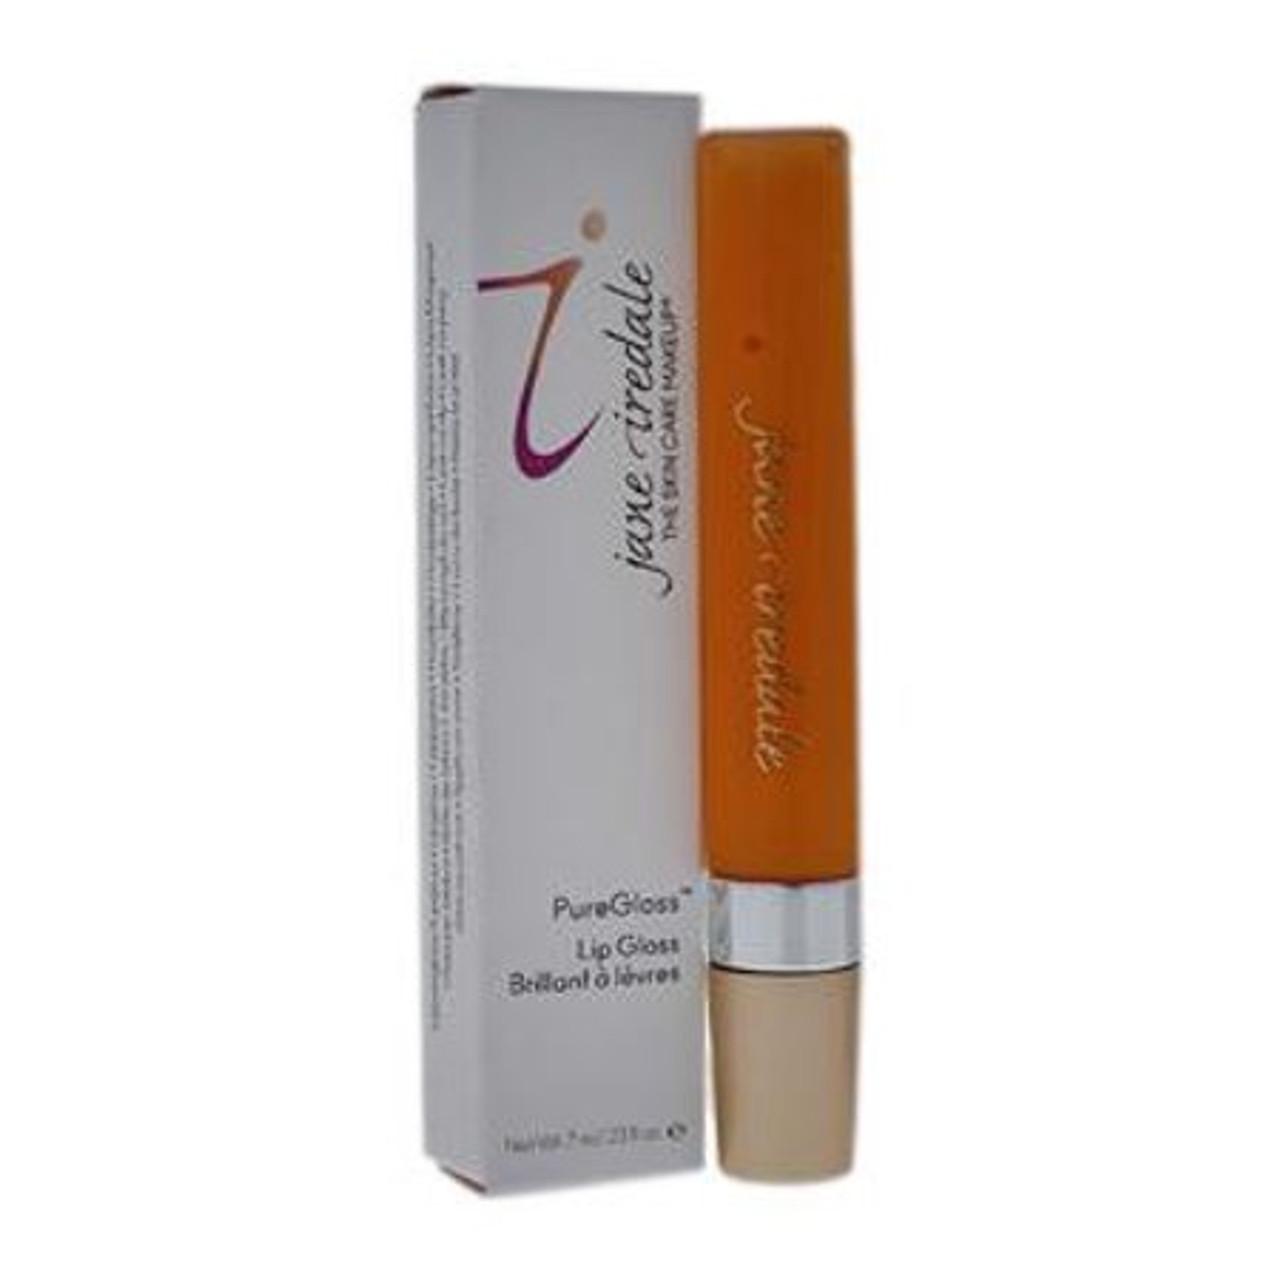 Bellini Lip Gloss